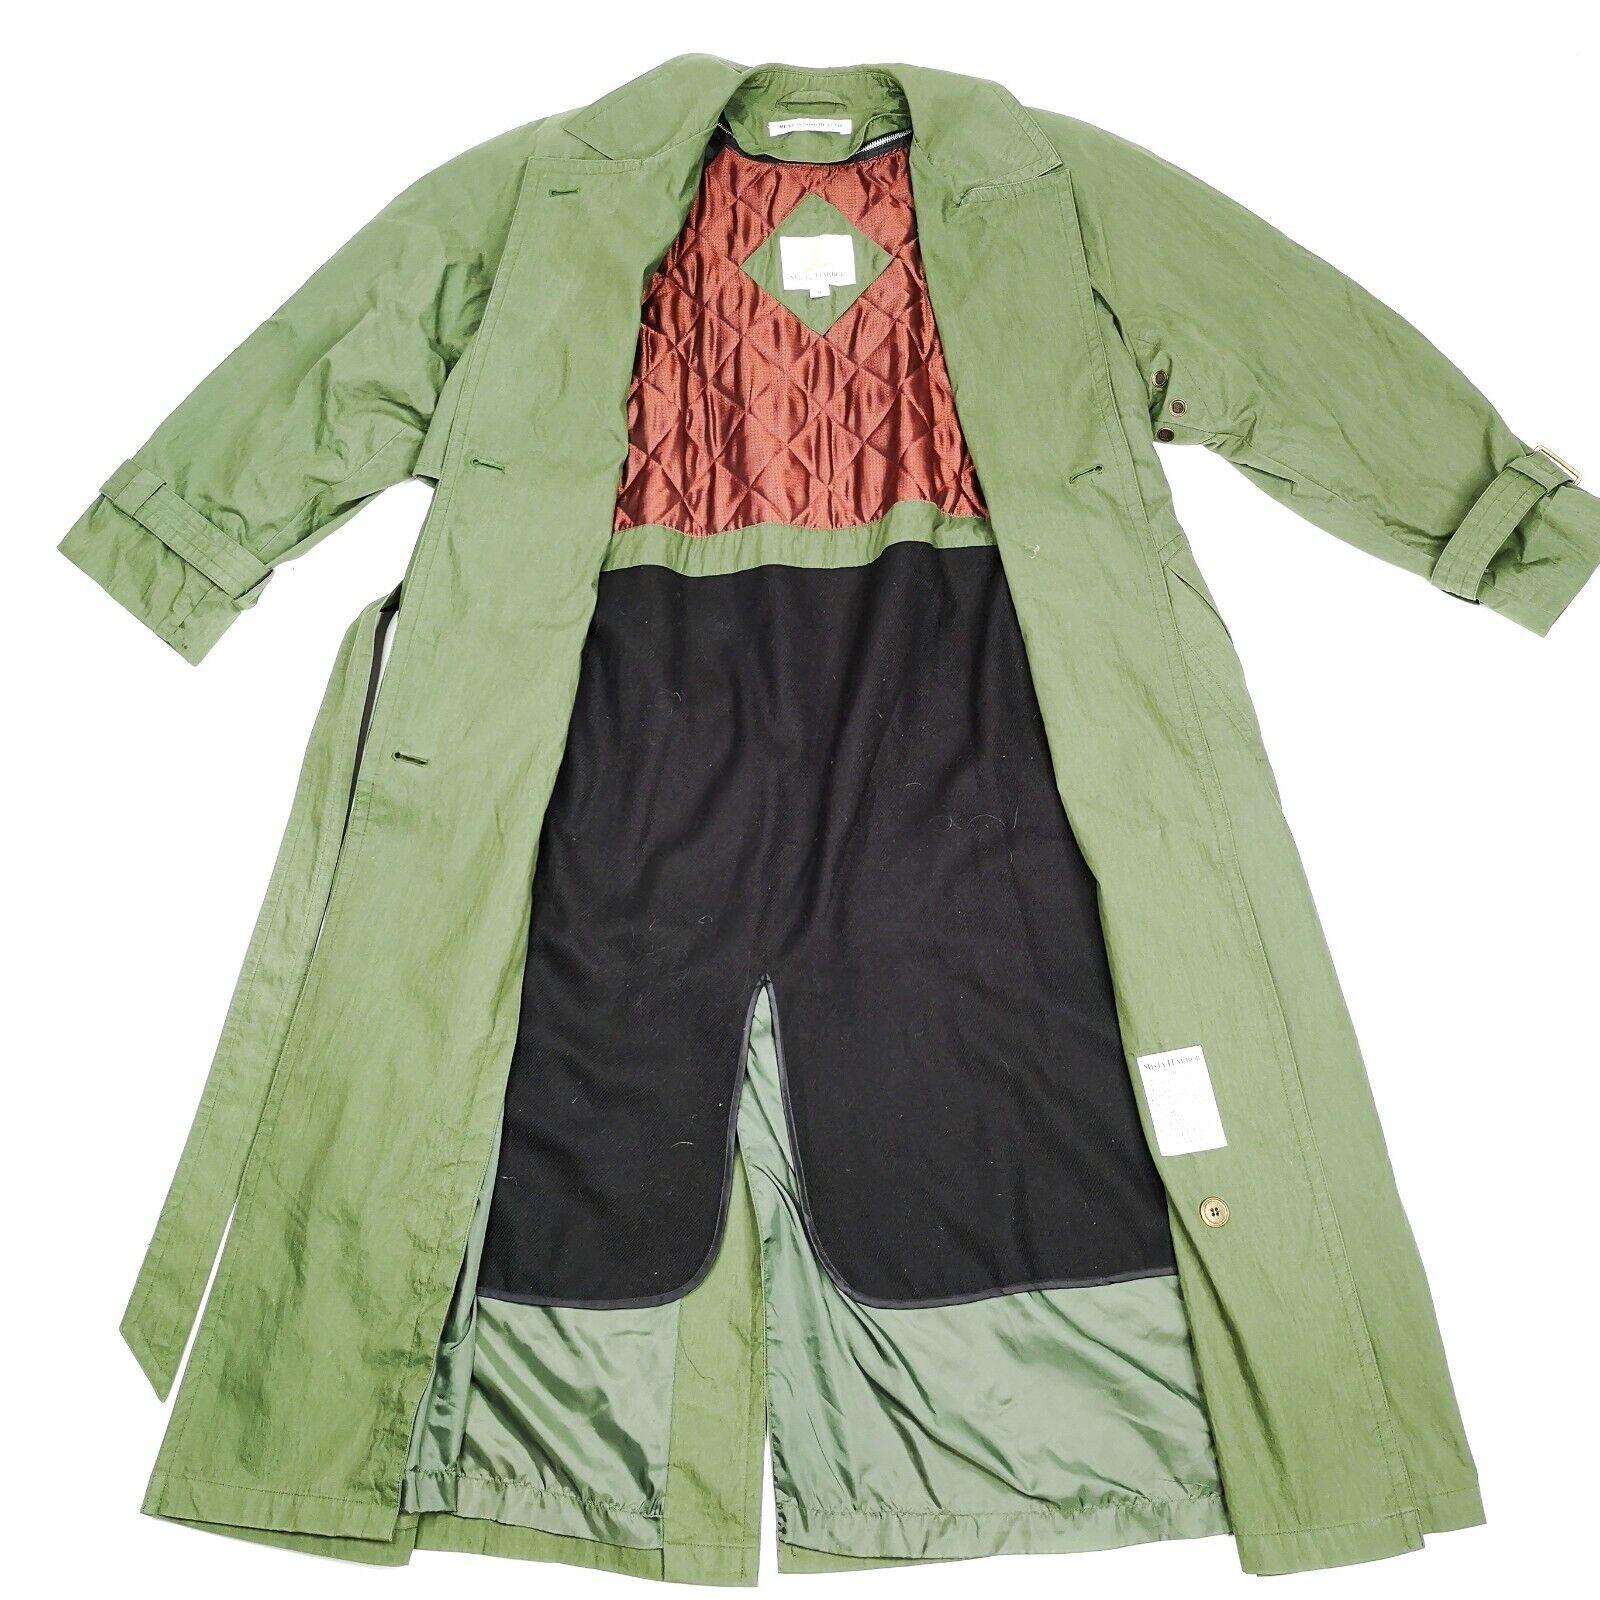 MISTY HARBOR Trench Coat Jacket 8 Olive Green - image 2